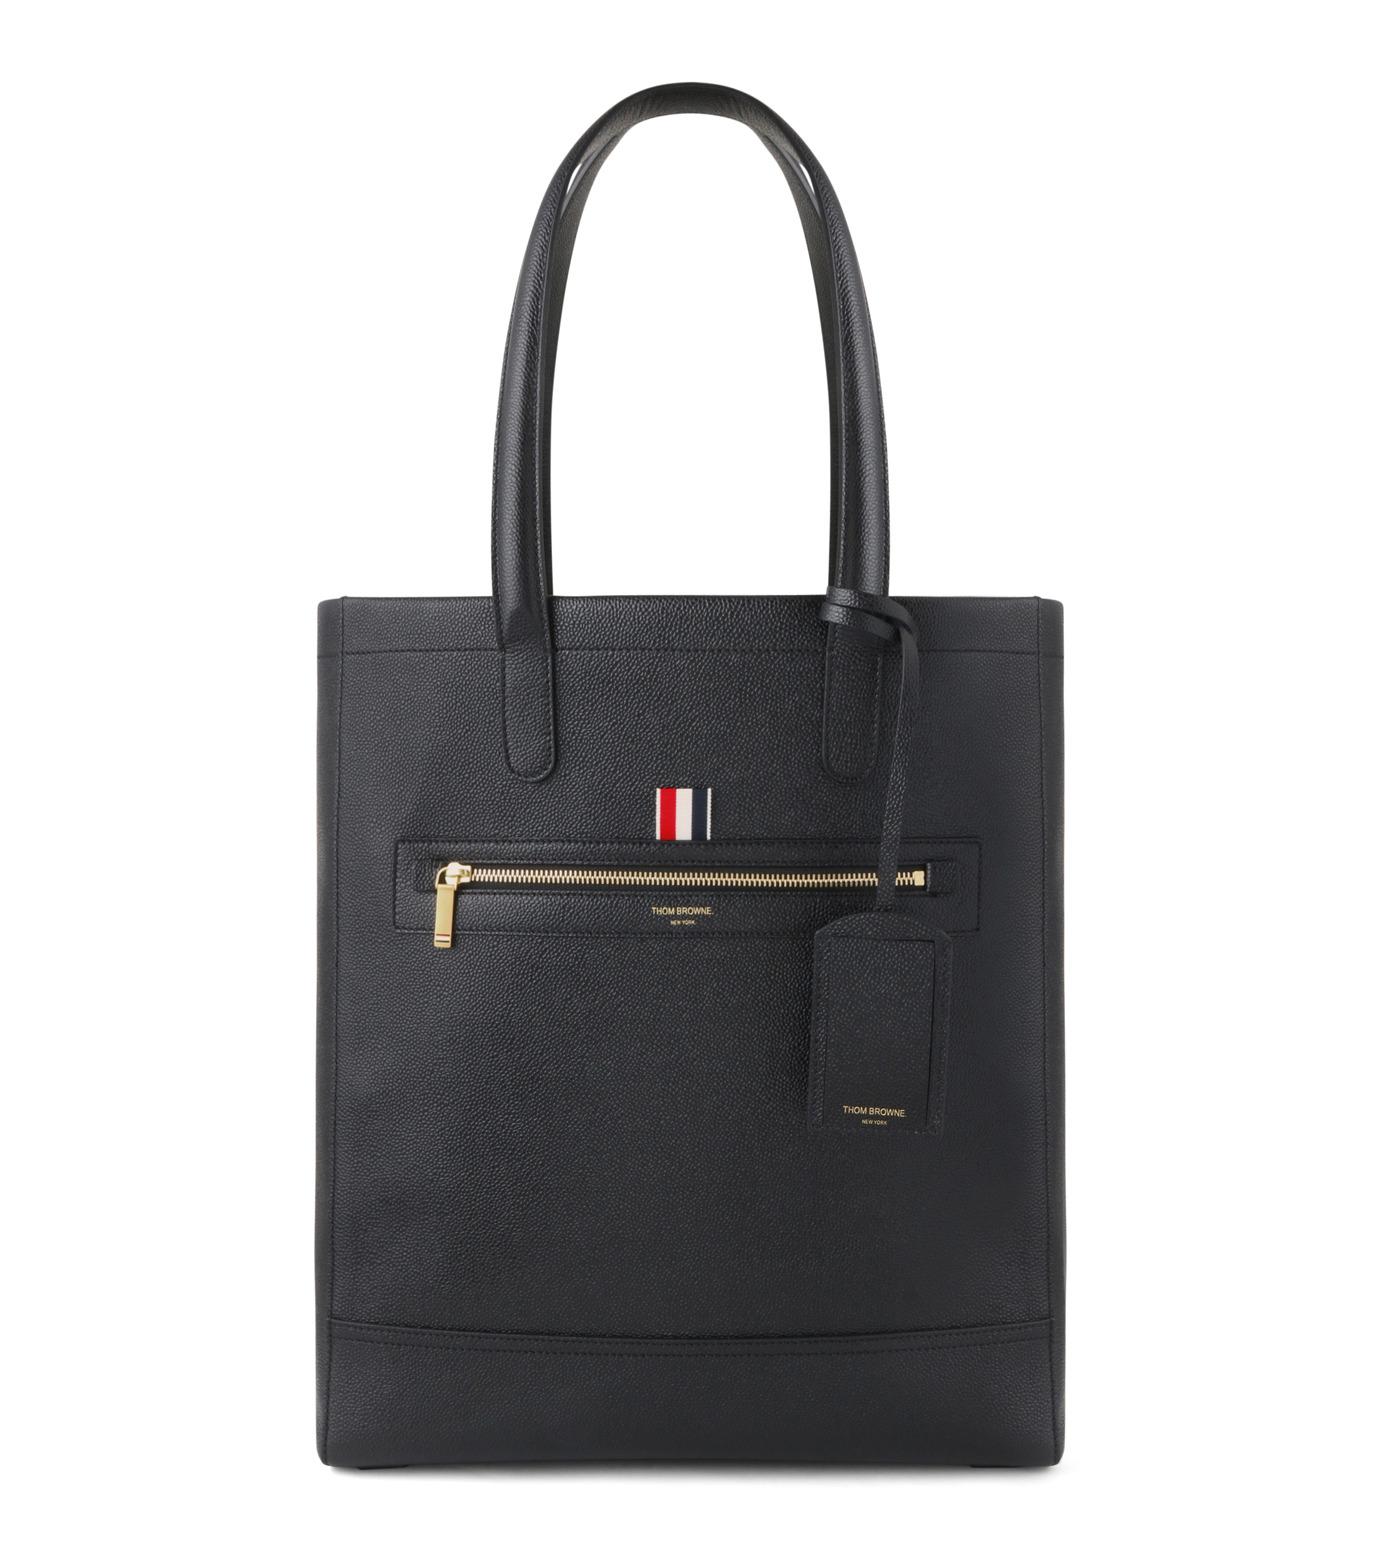 Thom Browne(トムブラウン)のLeather Tote-BLACK(ハンドバッグ/hand bag)-MAG059A00198-13 拡大詳細画像1